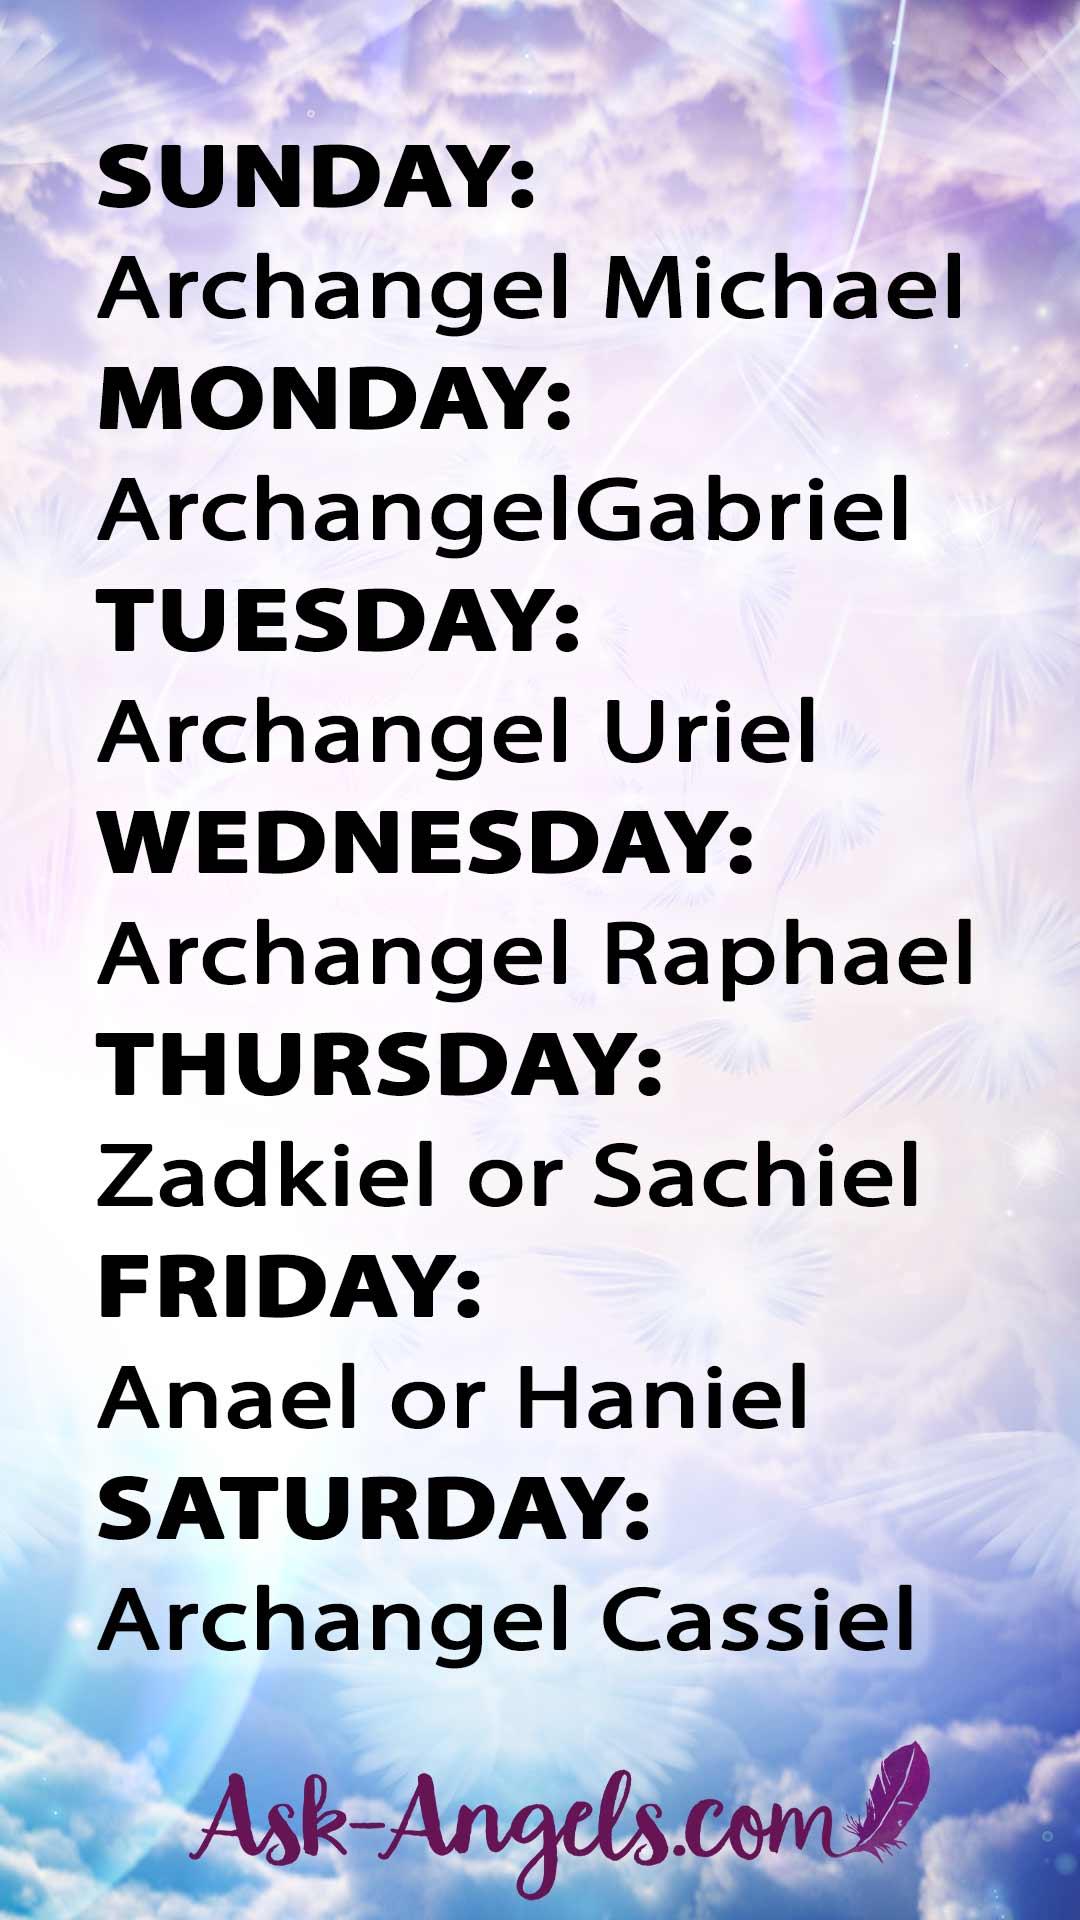 Seven Archangels of the Week!